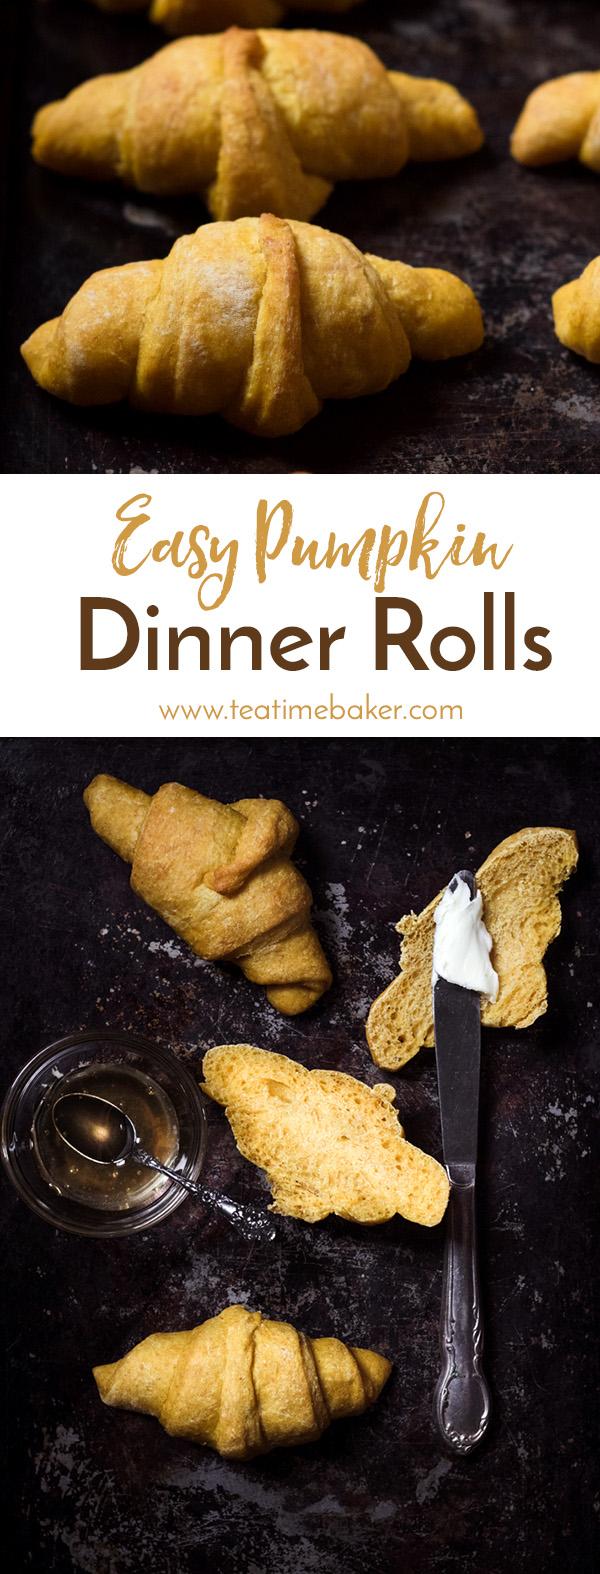 Easy Pumpkin Dinner Rolls